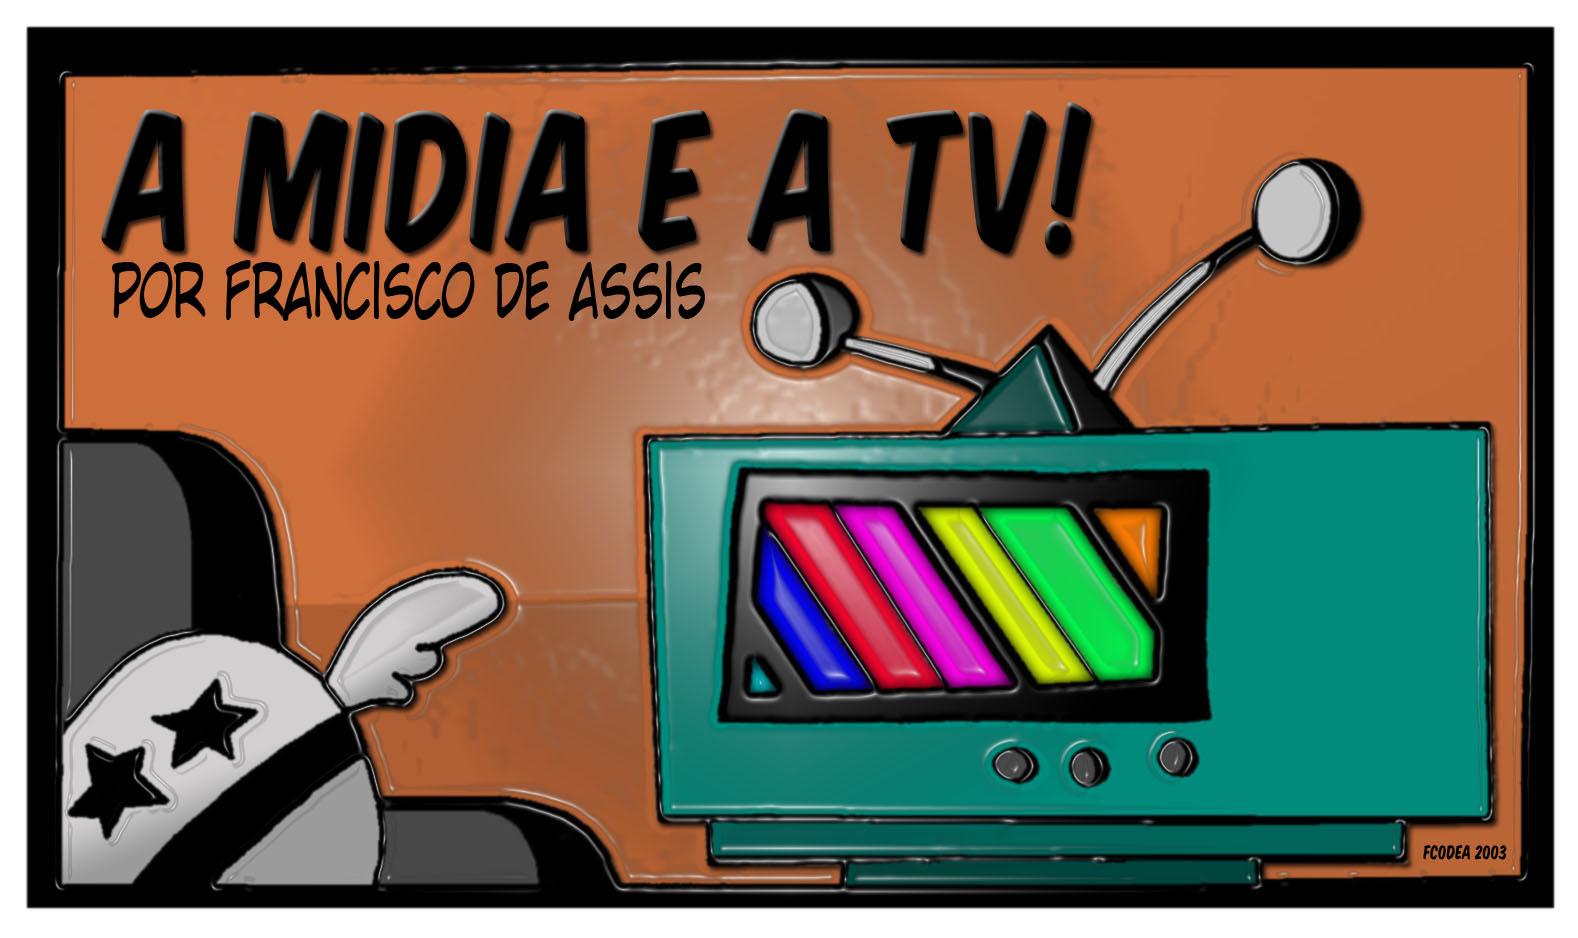 A Mídia e principalmente a TV!